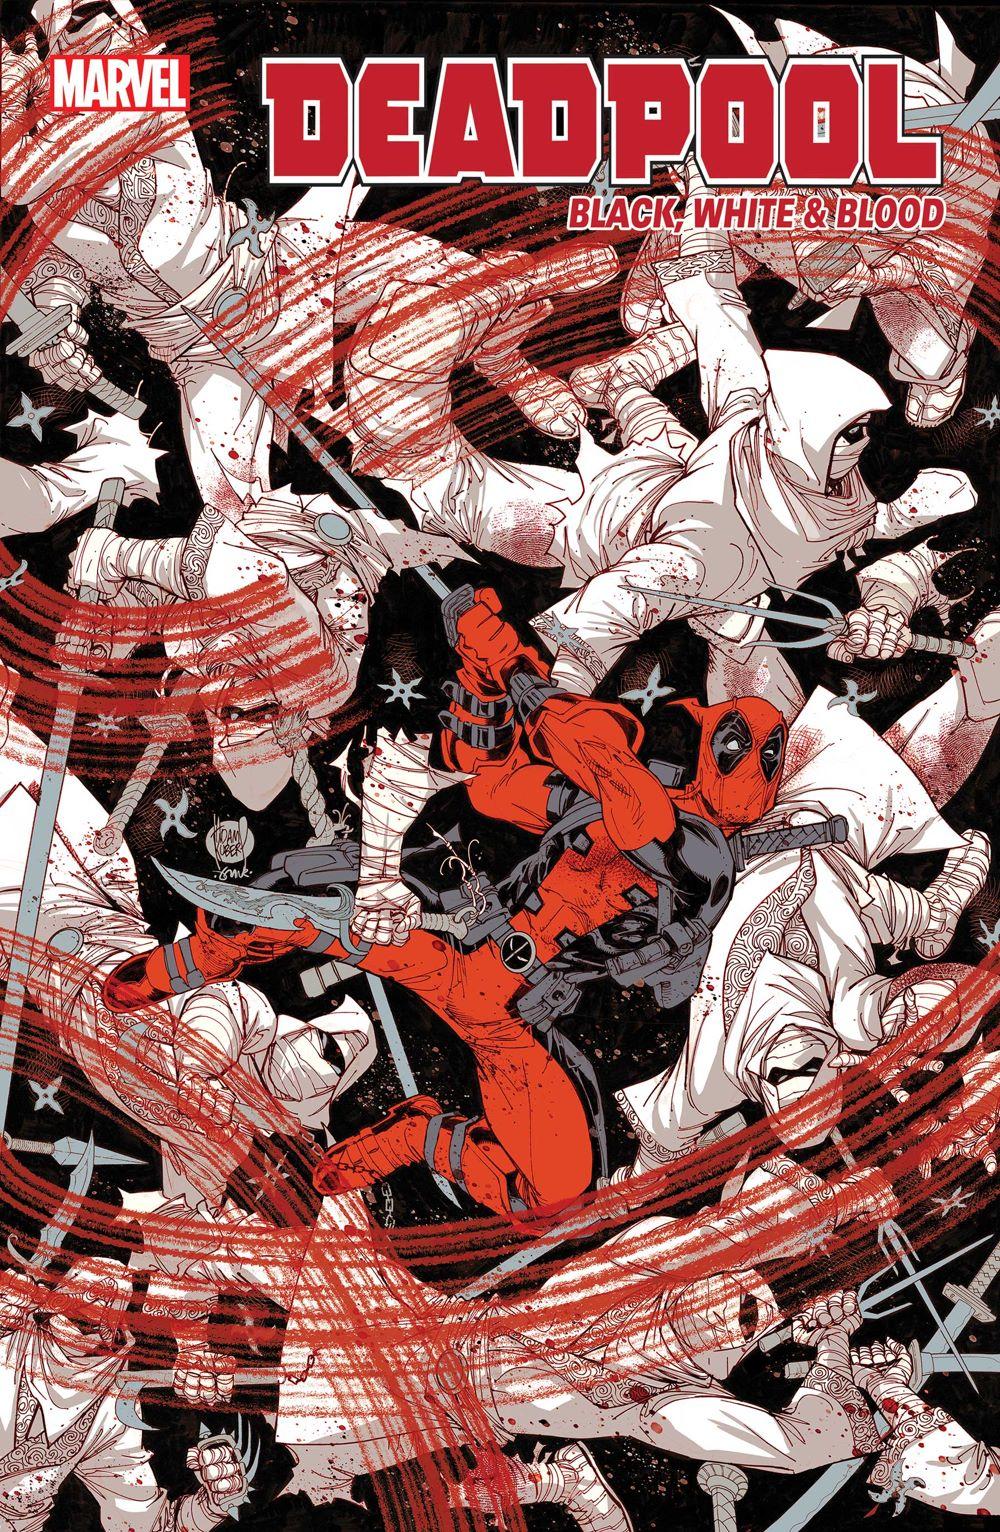 DPOOLBLKWHBL2021001_Cov Marvel Comics August 2021 Solicitations